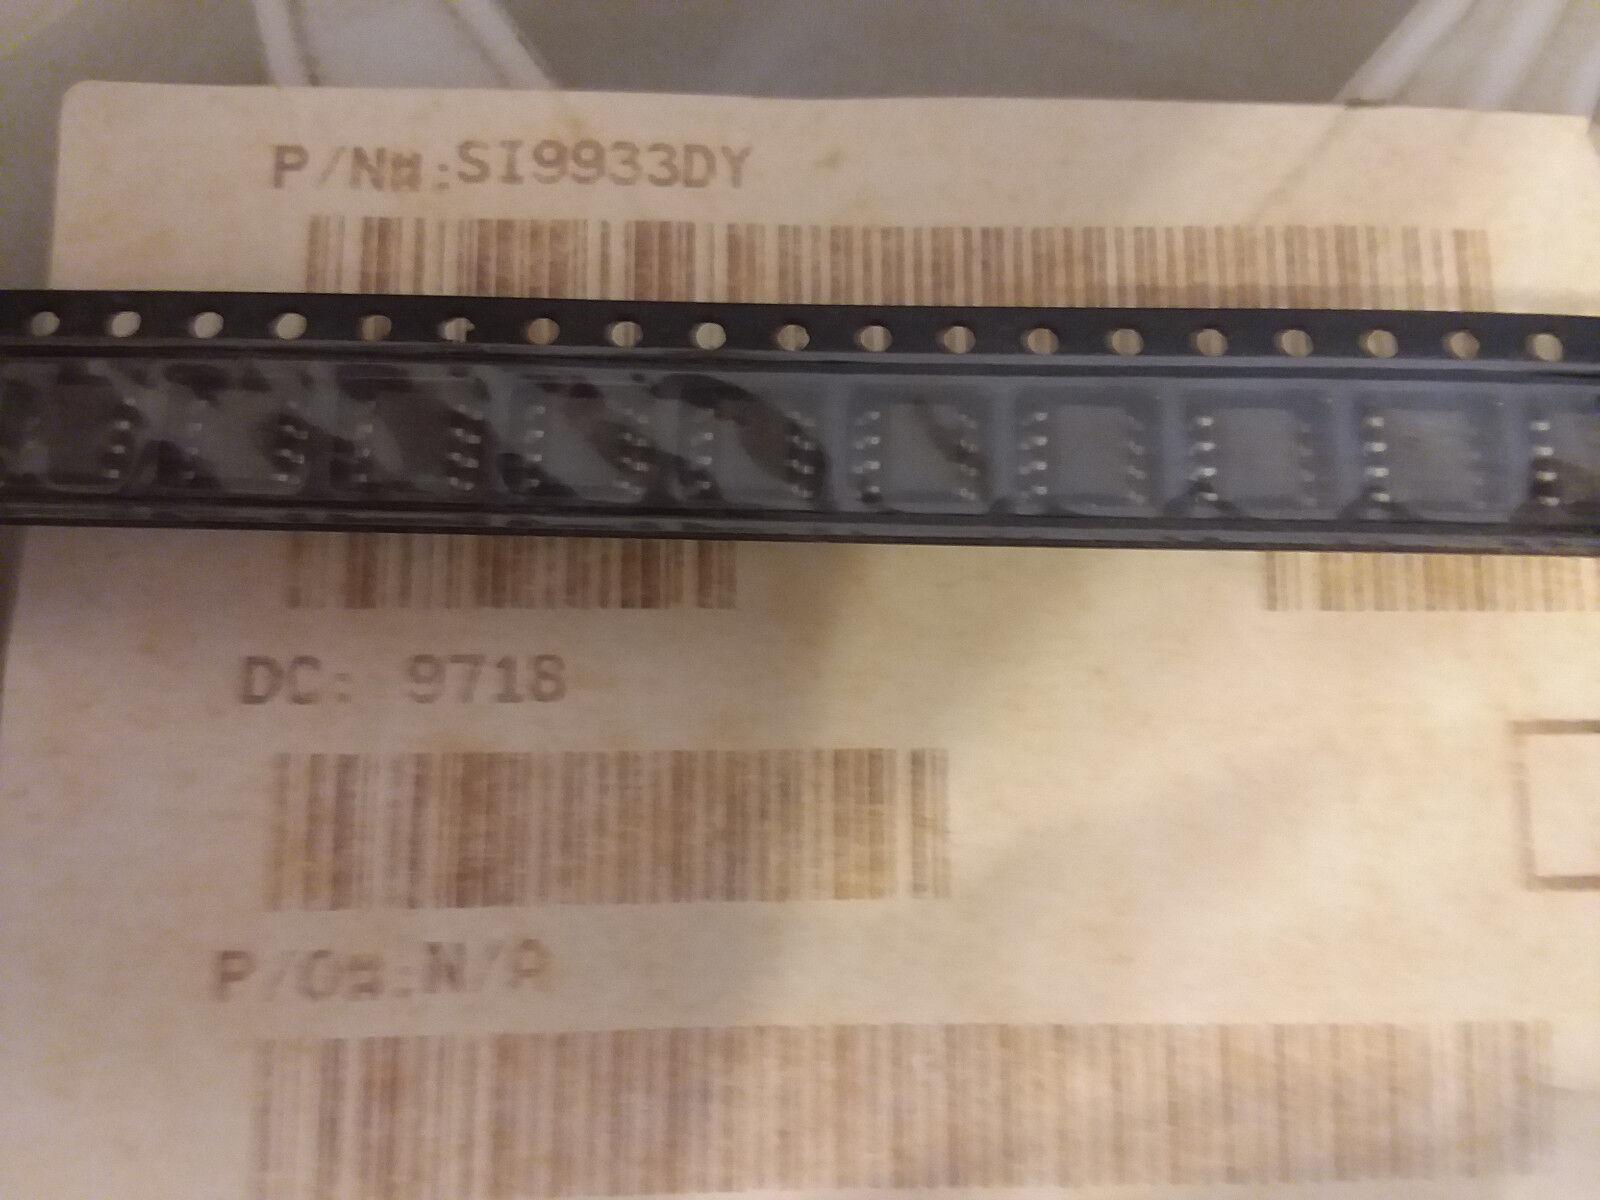 D DSS,7A I BR ,SO8 10X SI4412DY TRANSISTOR,MOSFET,N-CHANNEL,30V V